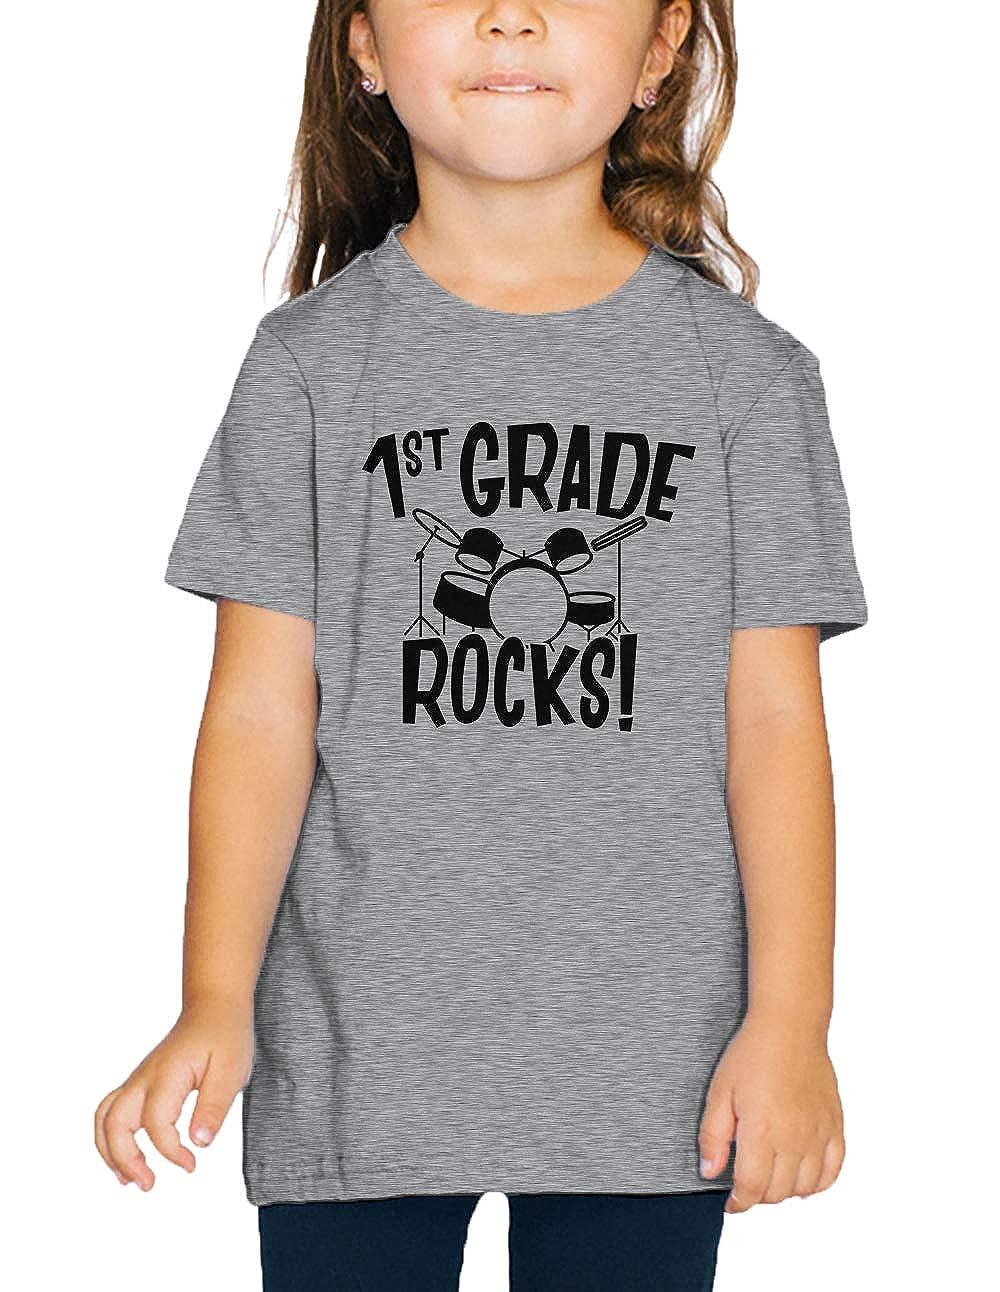 SpiritForged Apparel 1st Grade Rocks Back to School Toddler T-Shirt